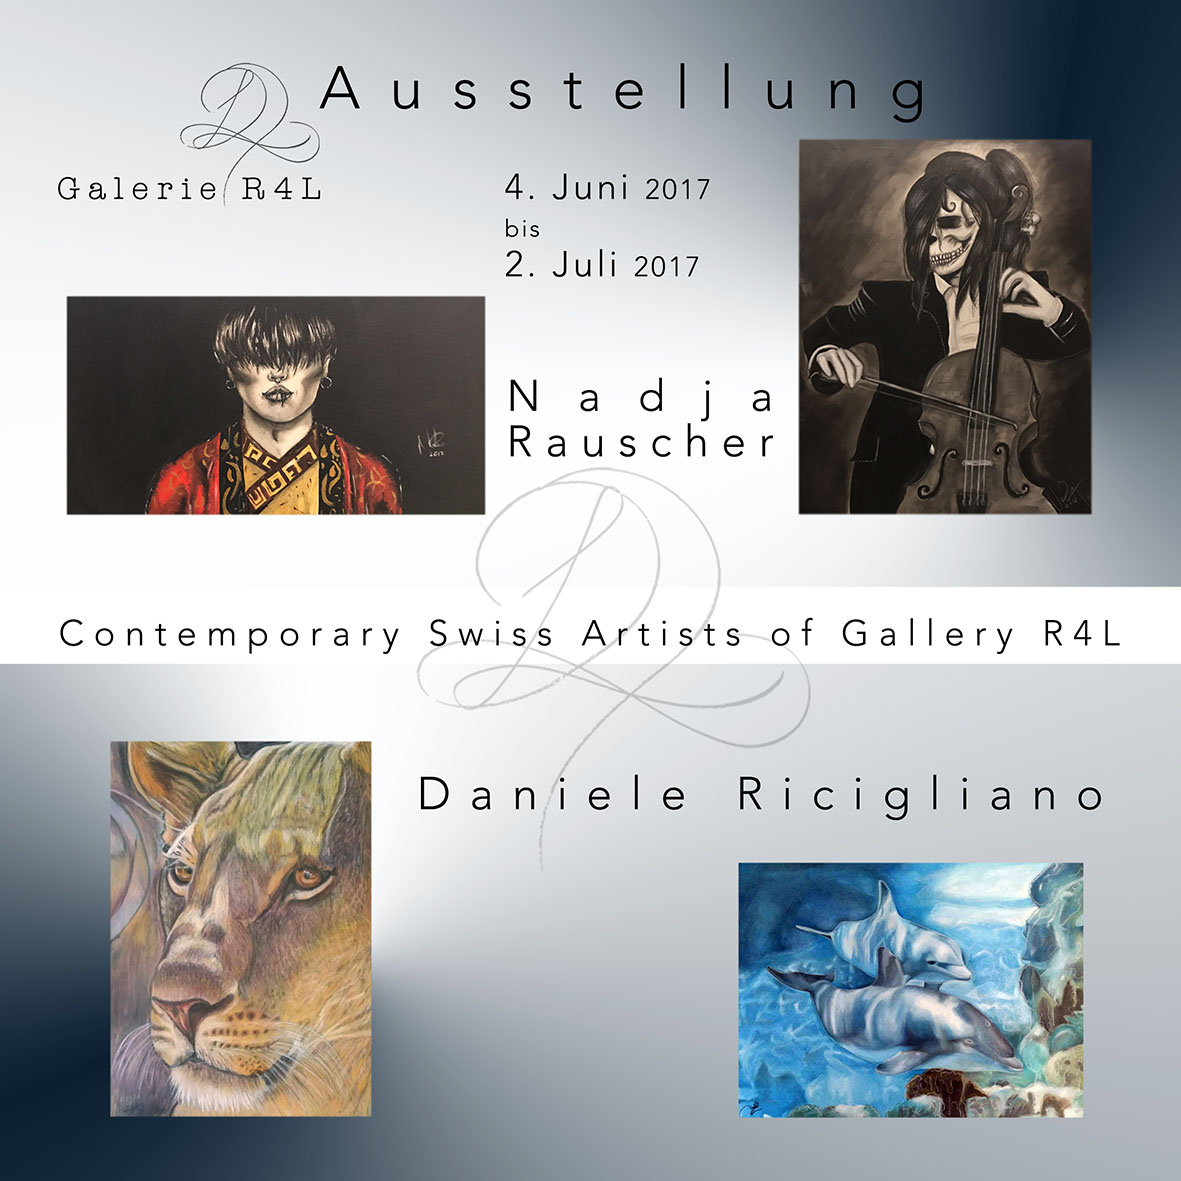 Kunstausstellung Nadia Rauscher & Daniele Ricigliano